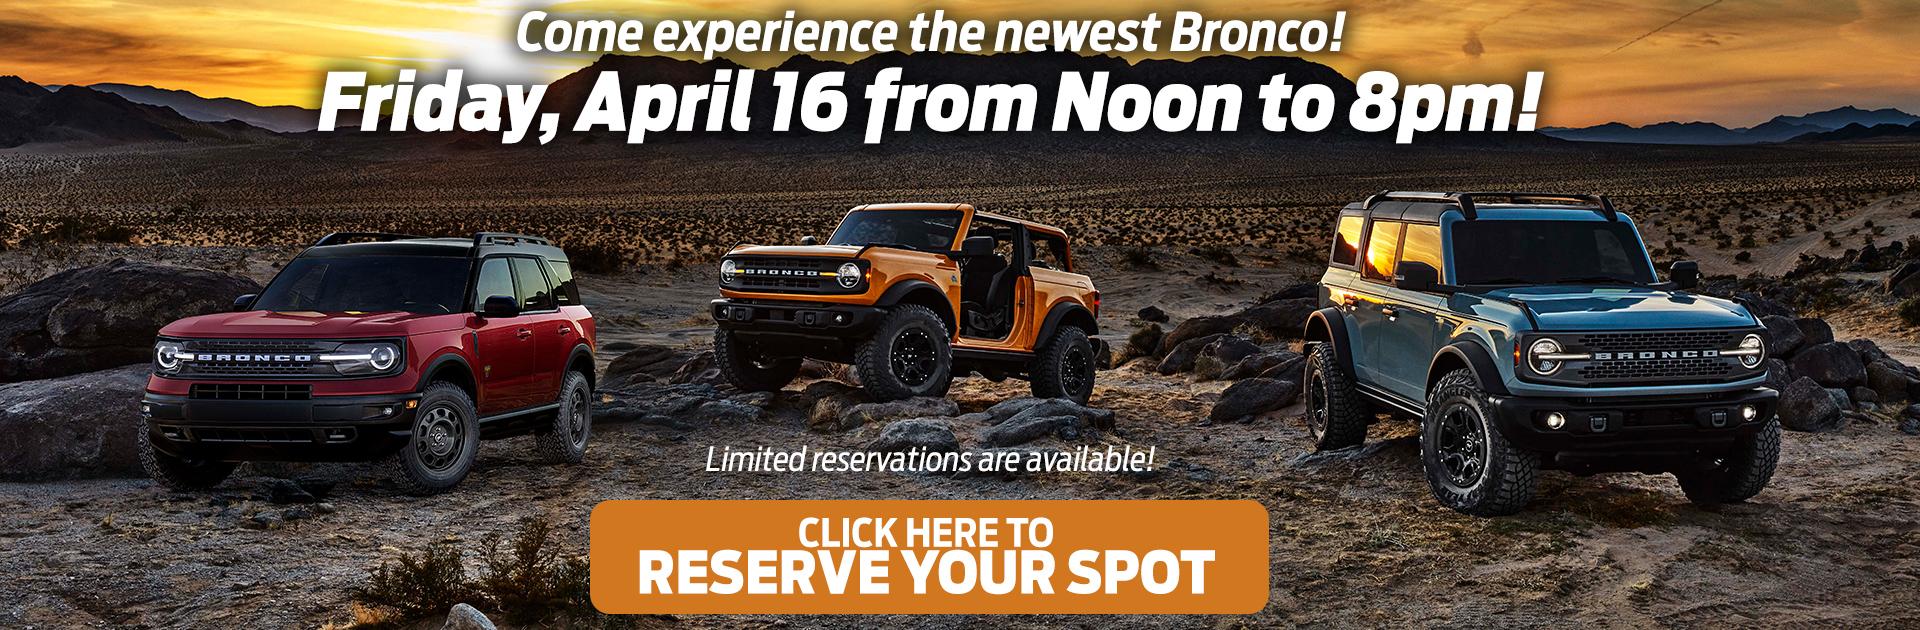 Bronco Web Banner